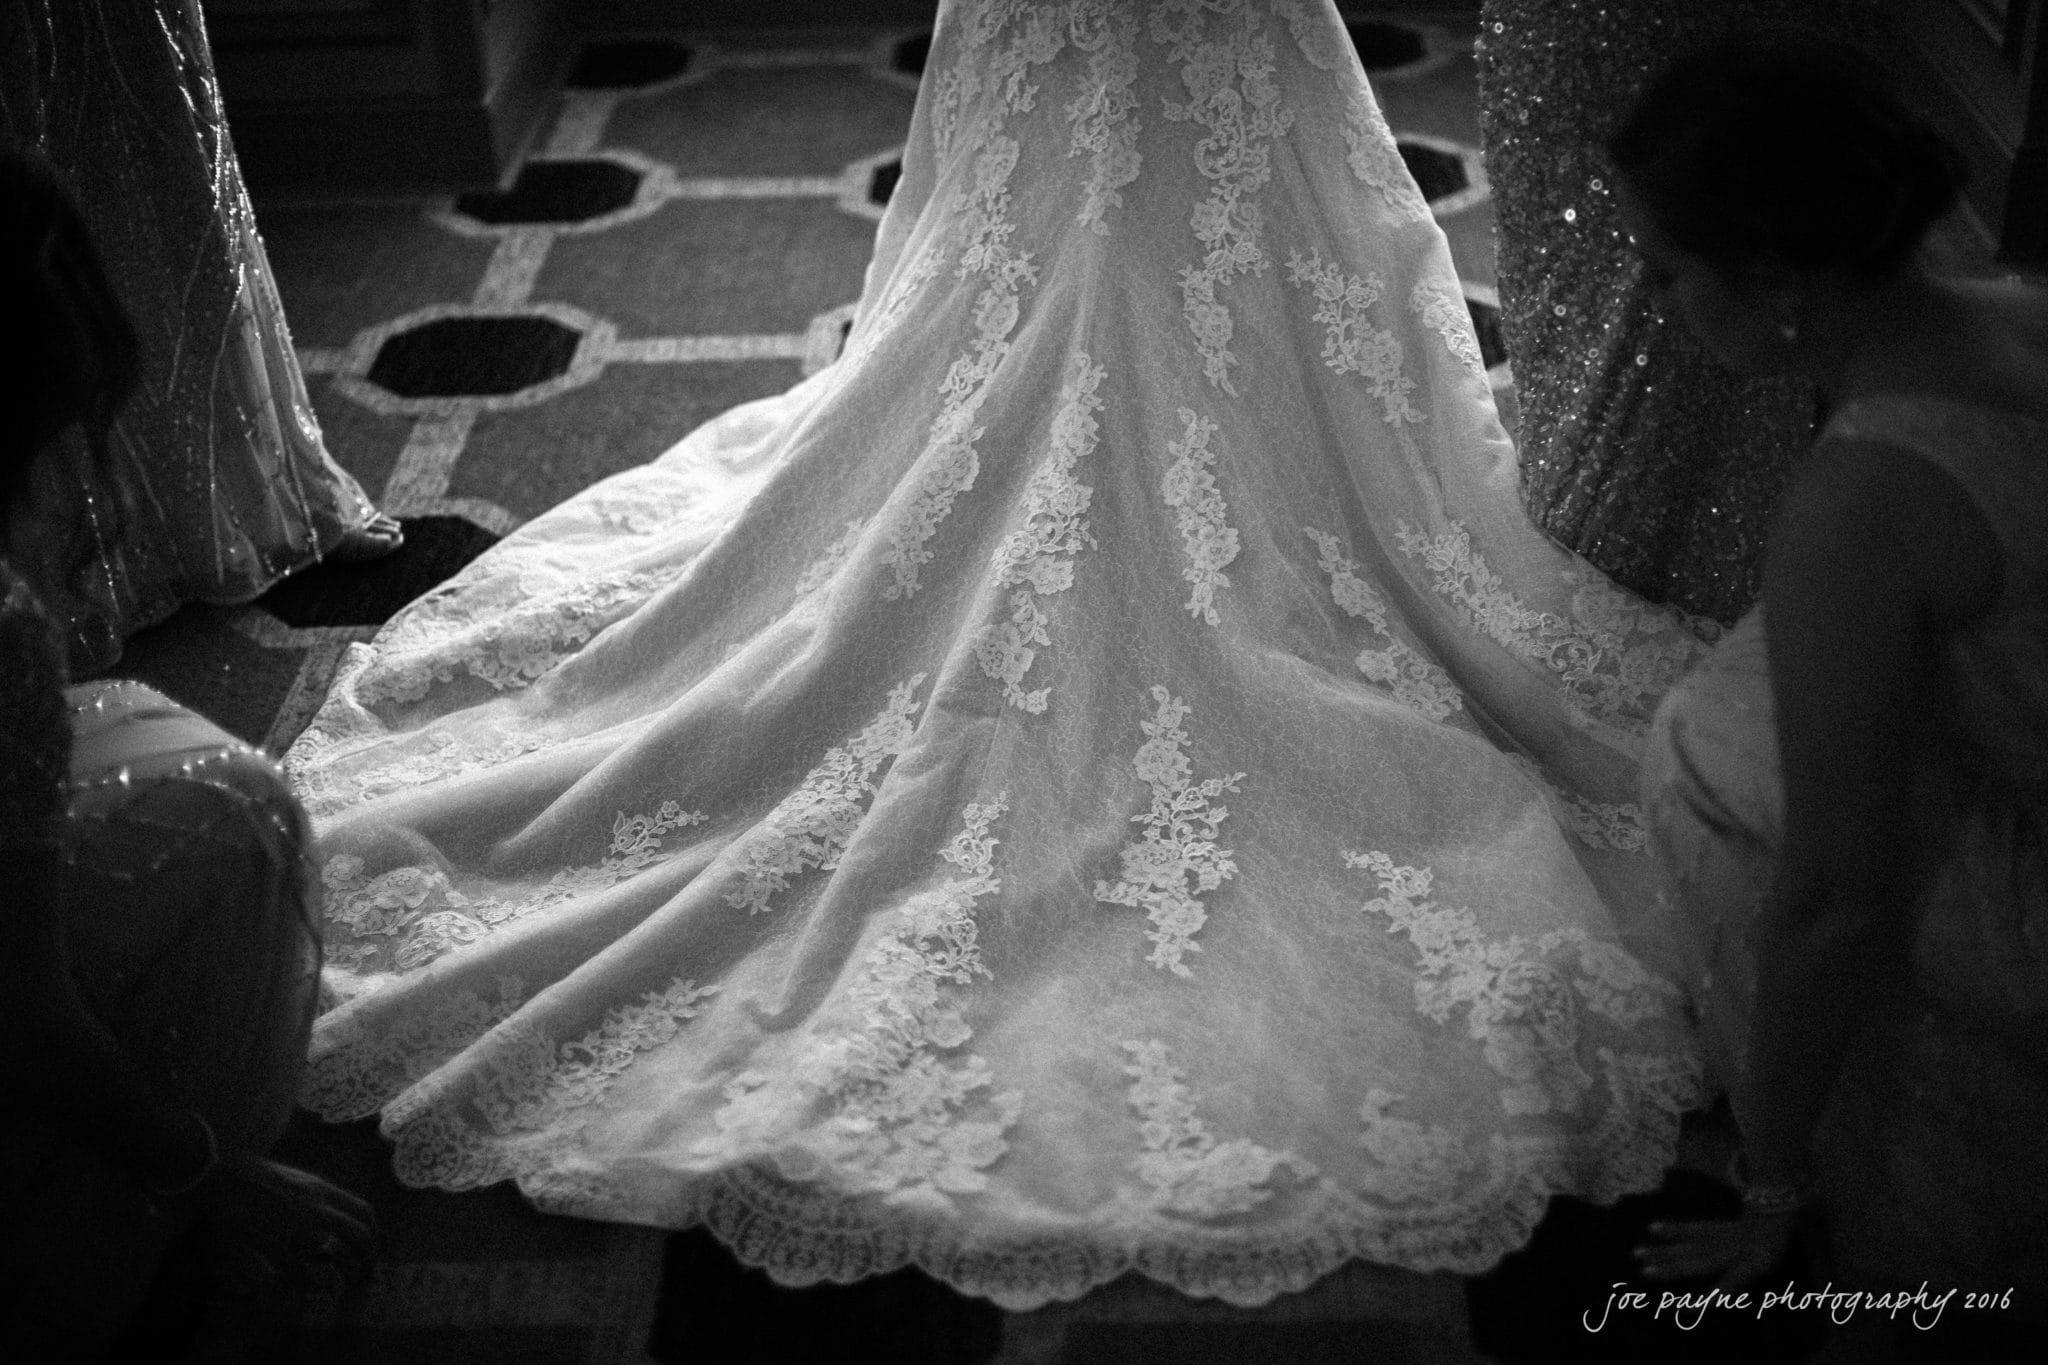 city-club-raleigh-wedding-photography-lauren-adam-12